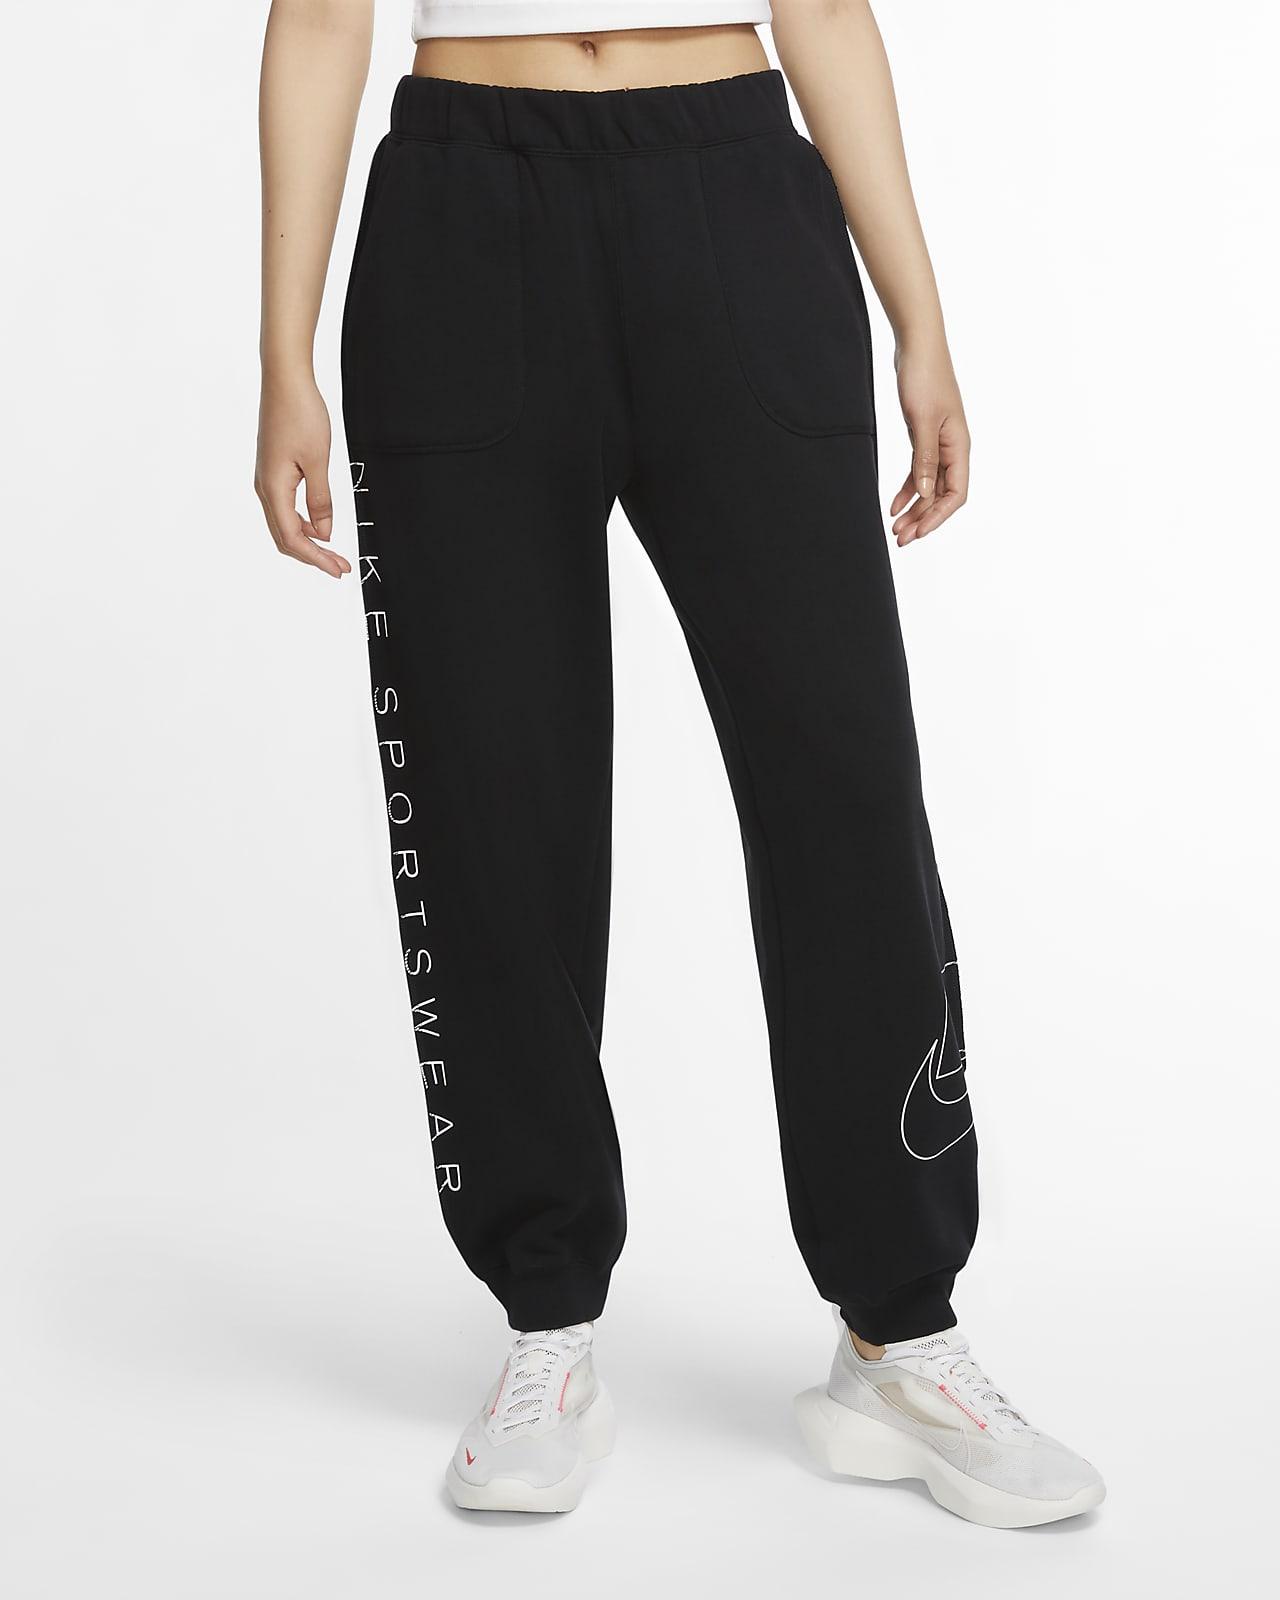 Calças de lã cardada Nike Sportswear NSW para mulher